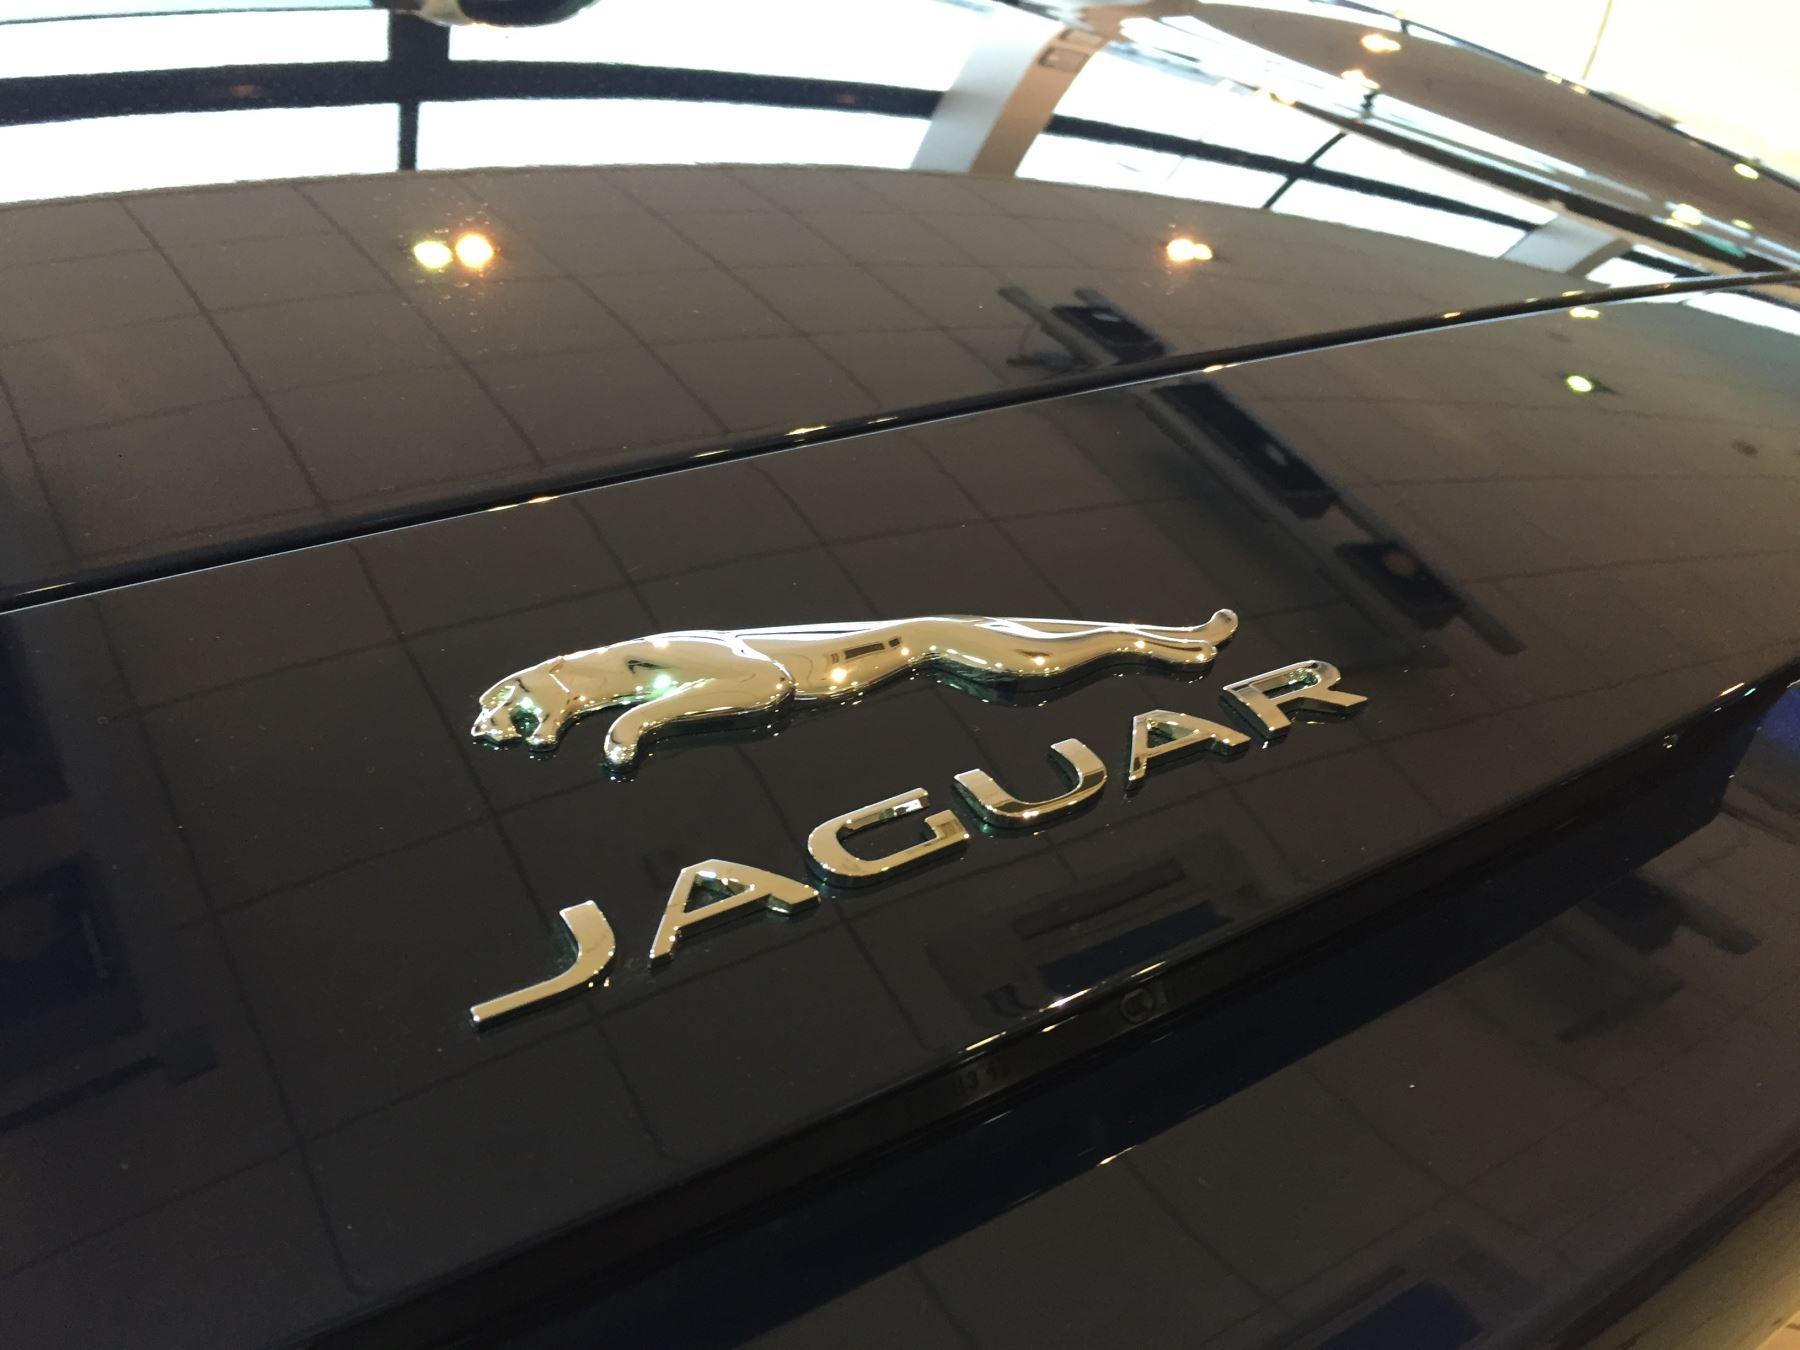 Jaguar F-TYPE 2.0 P300 R-Dynamic image 6